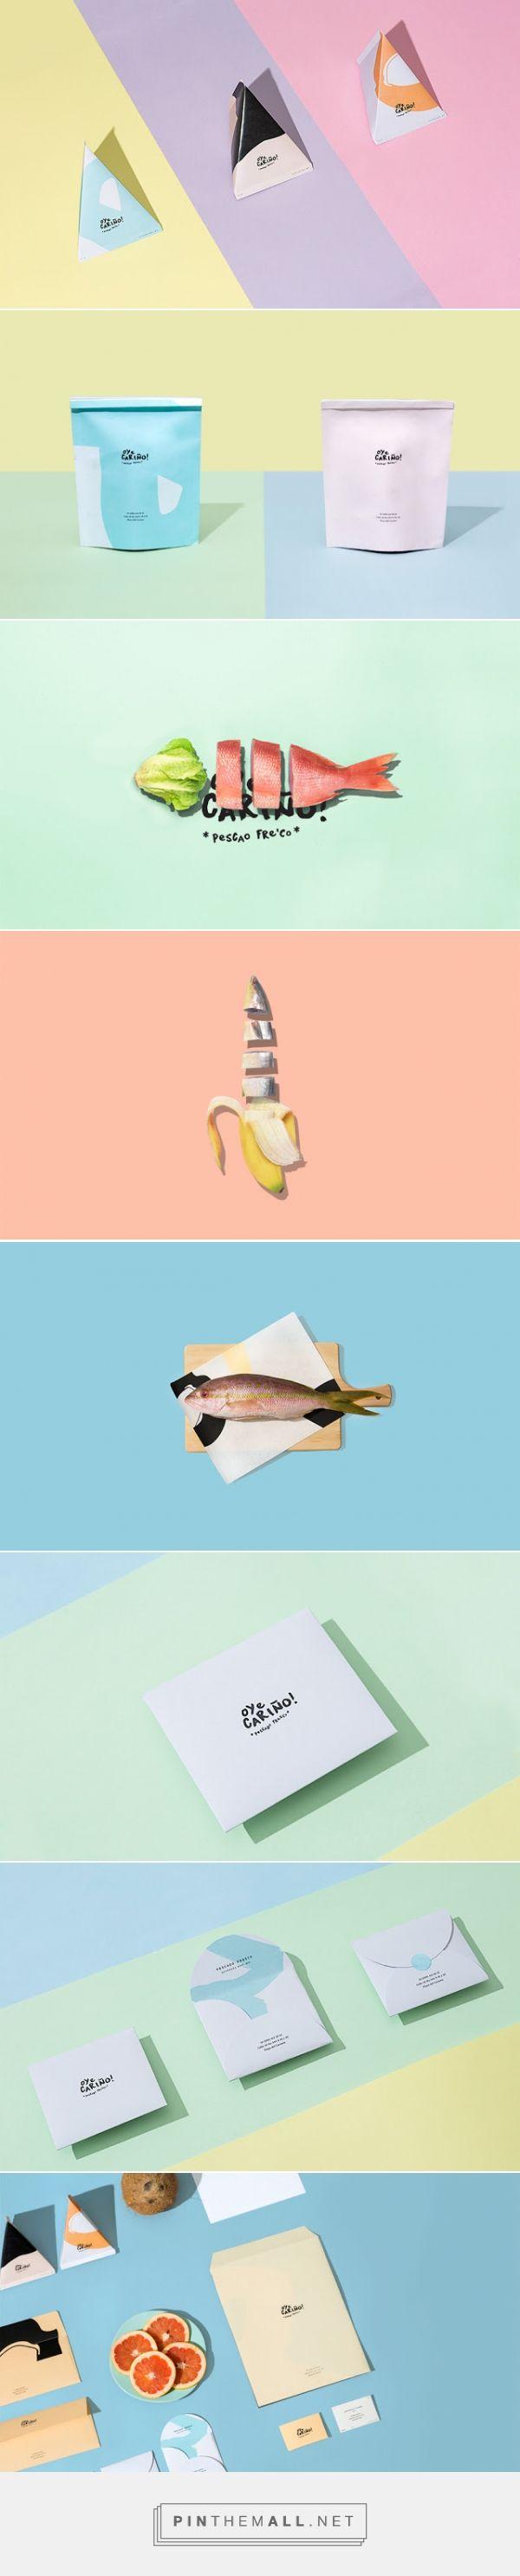 Oye Cariño / seafood restaurant // branding + identity design + package design + portfolio layout